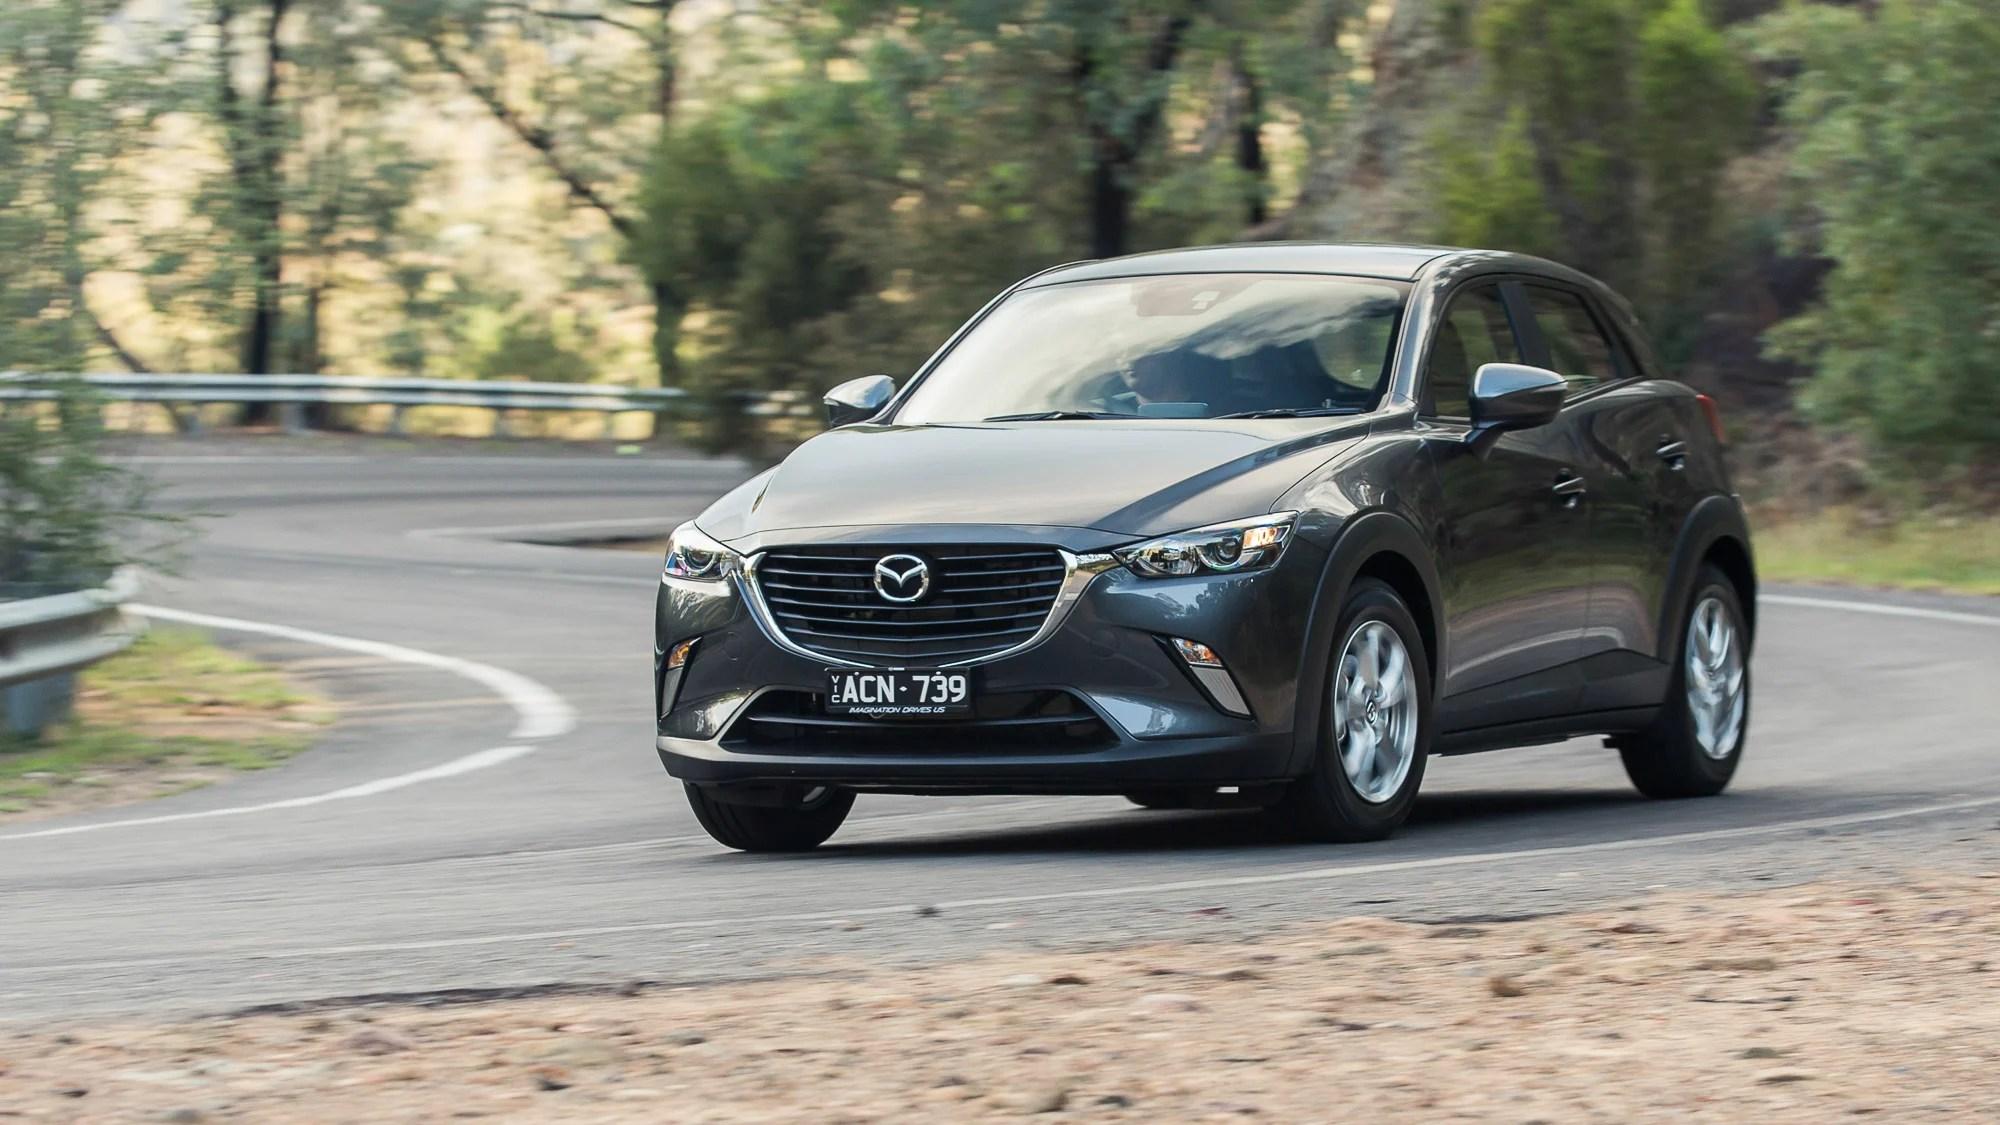 2015 Mazda Cx 3 Review Caradvice